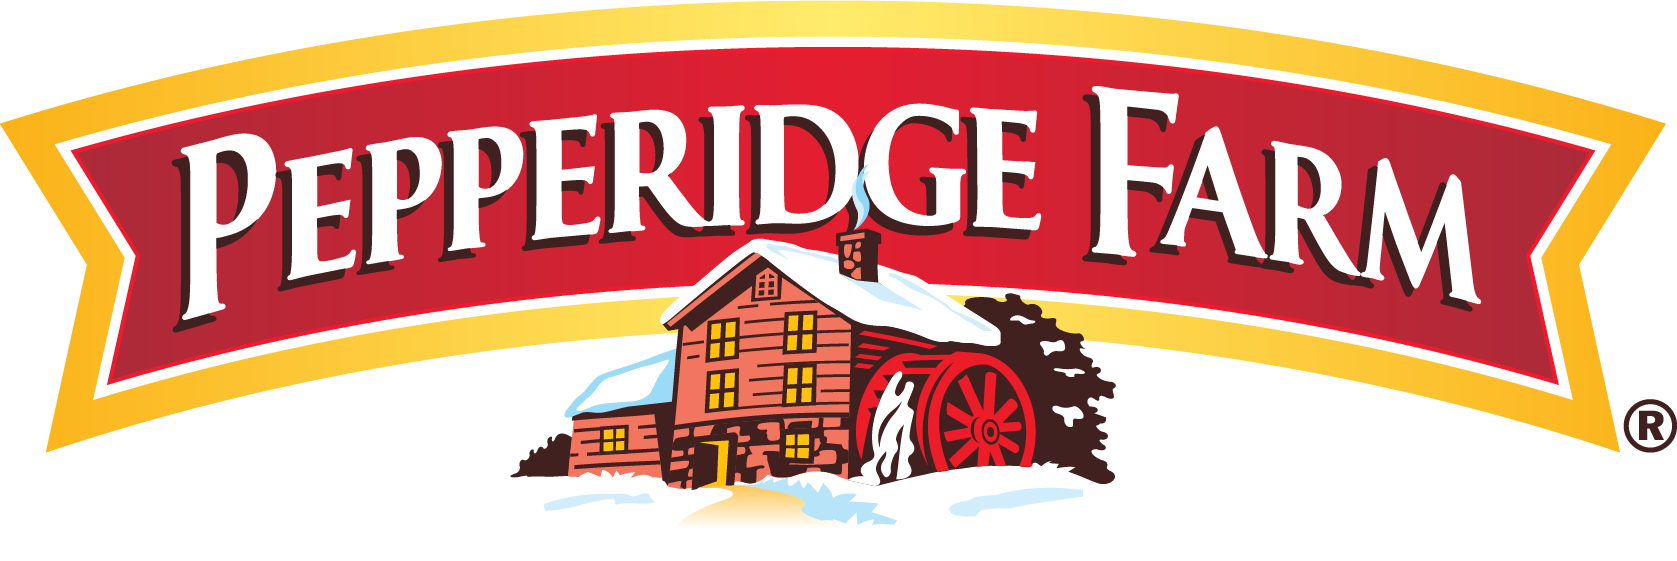 Pepperidge Farms-01